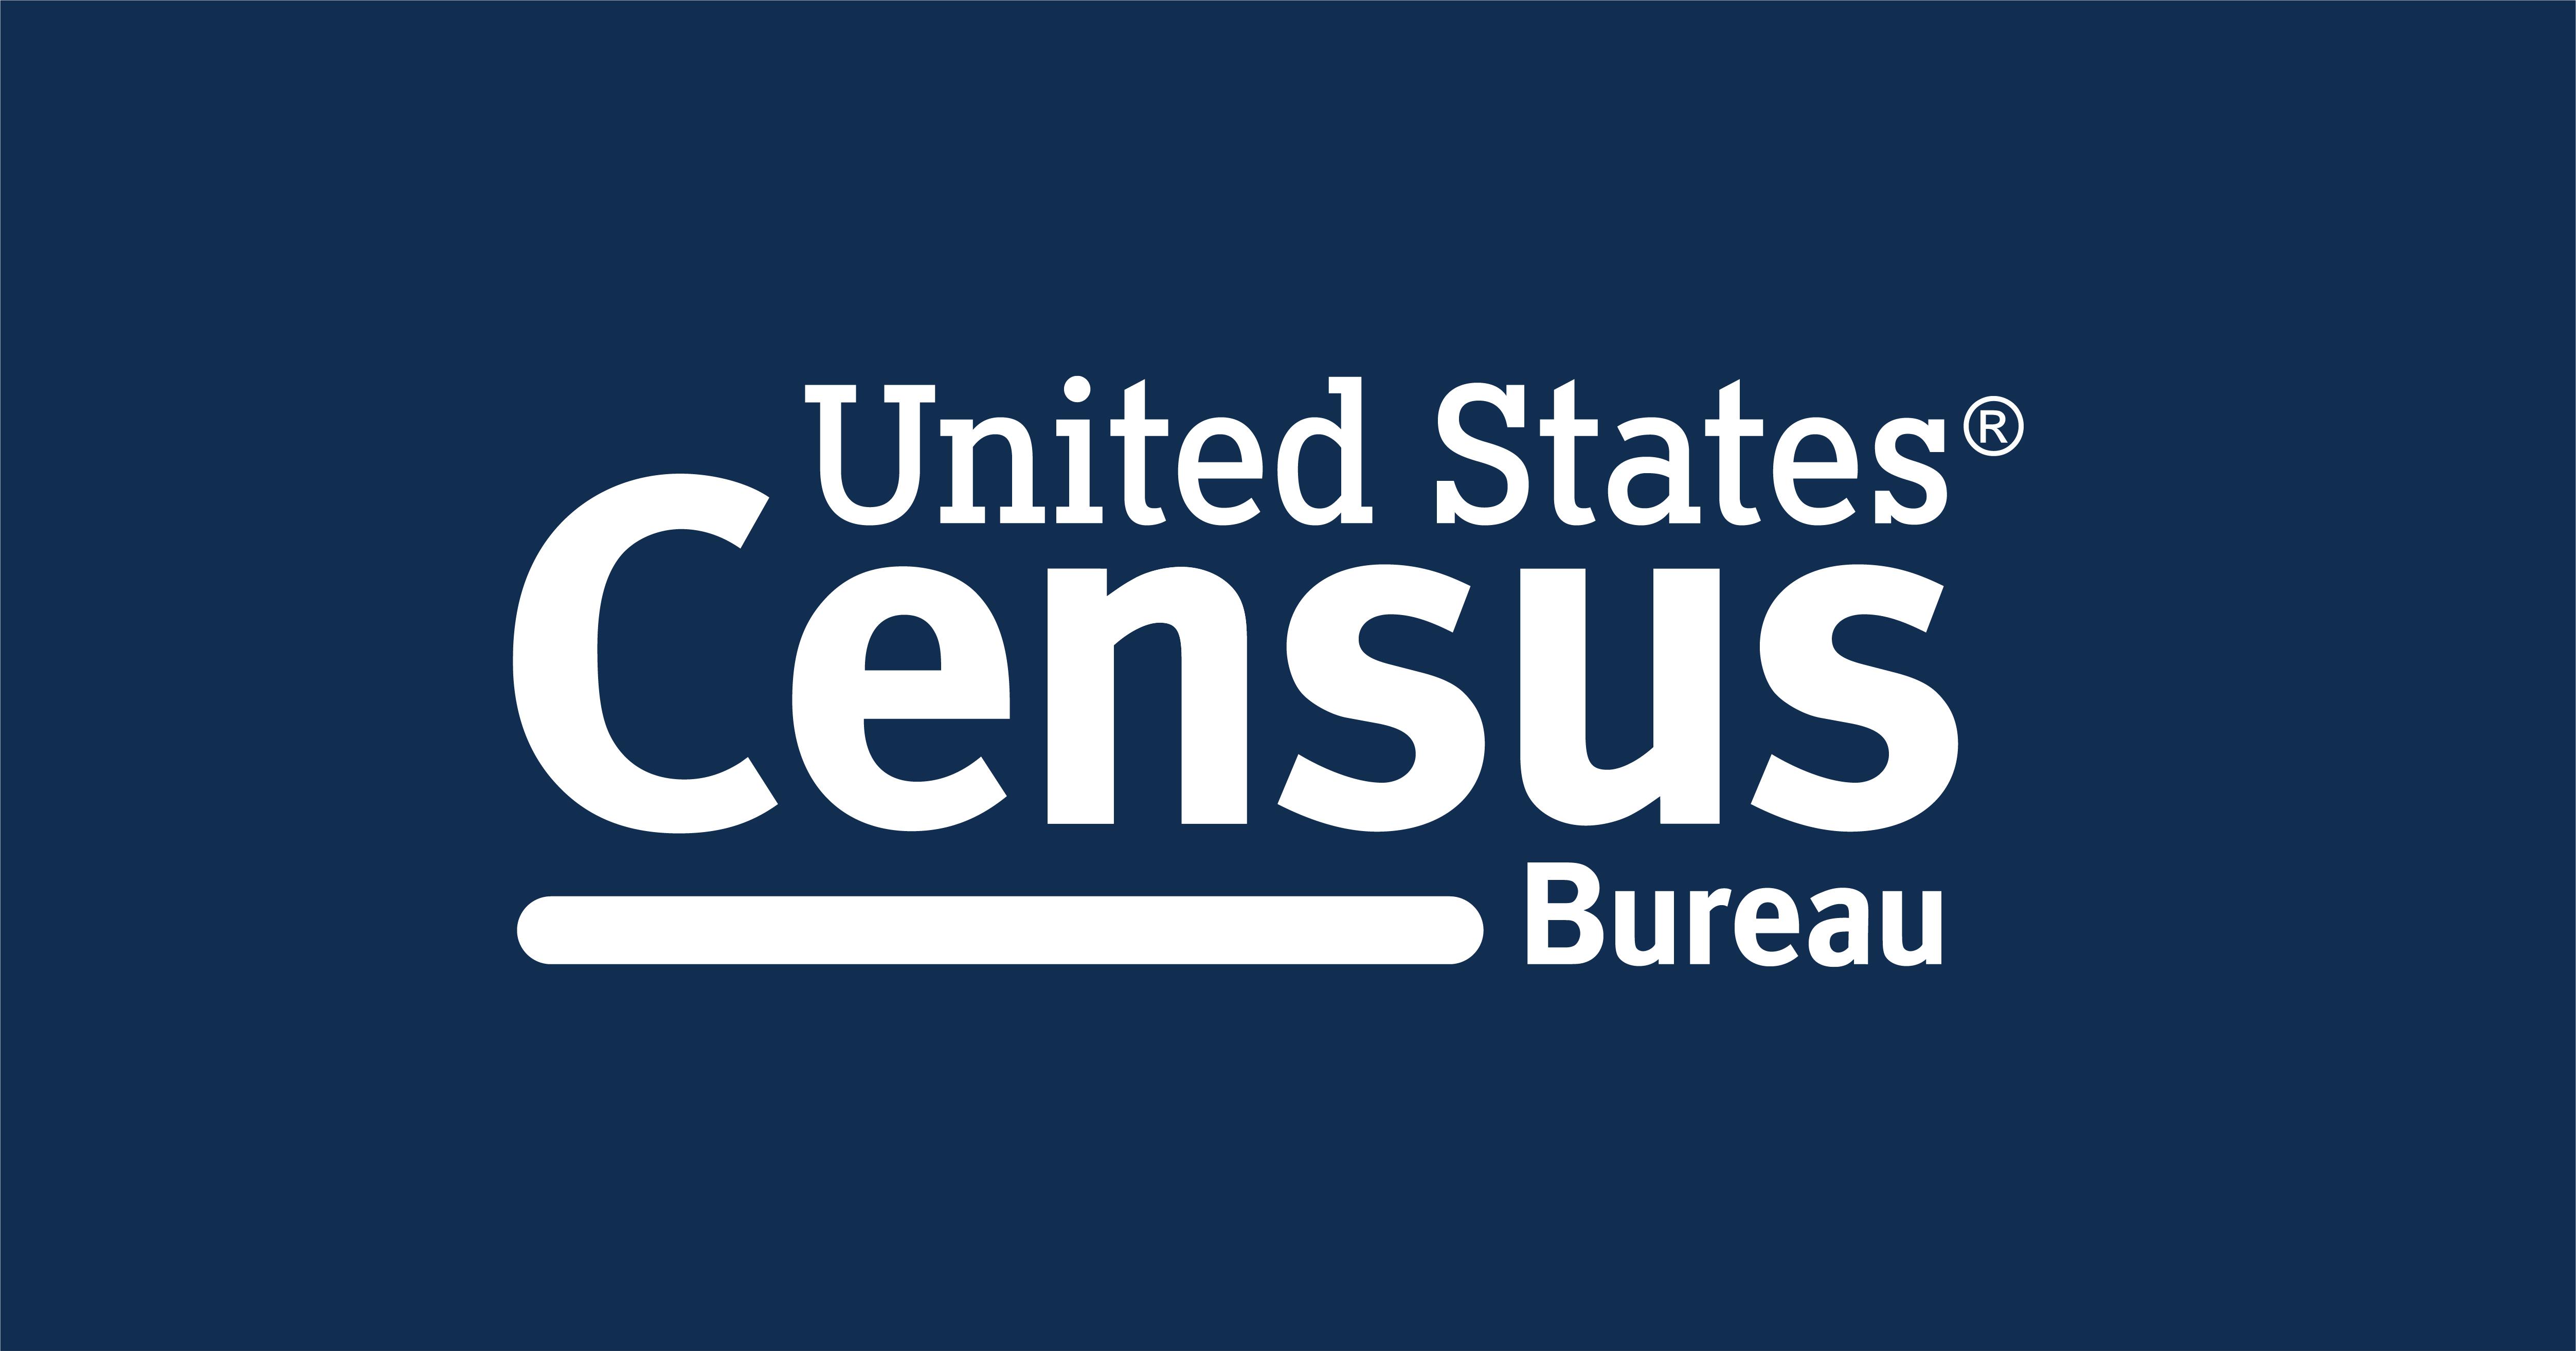 North and South Carolina make Census Bureau top 10 growth list